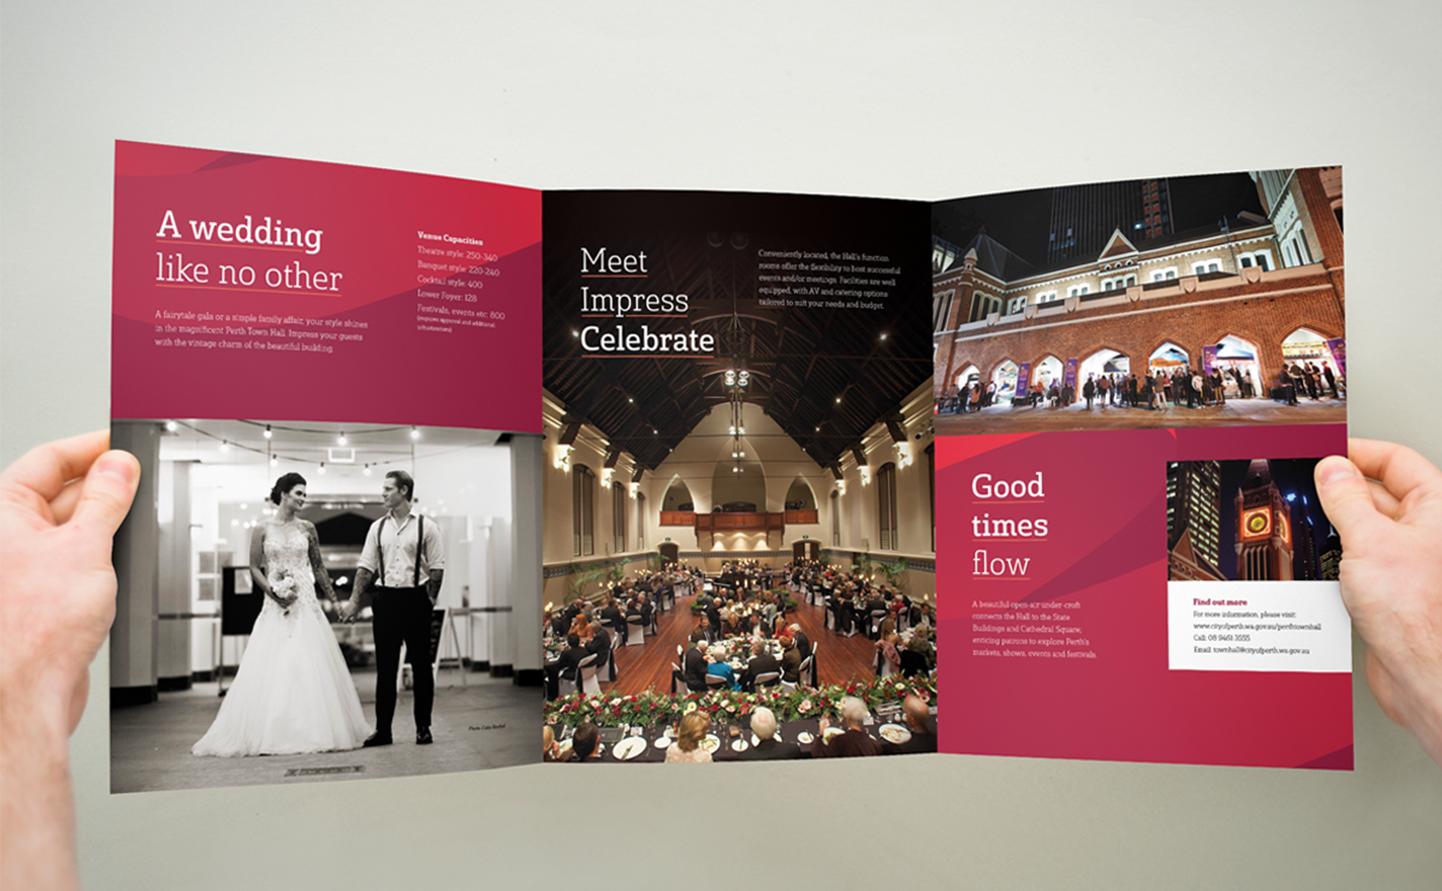 Perth Town Hall marketing materials